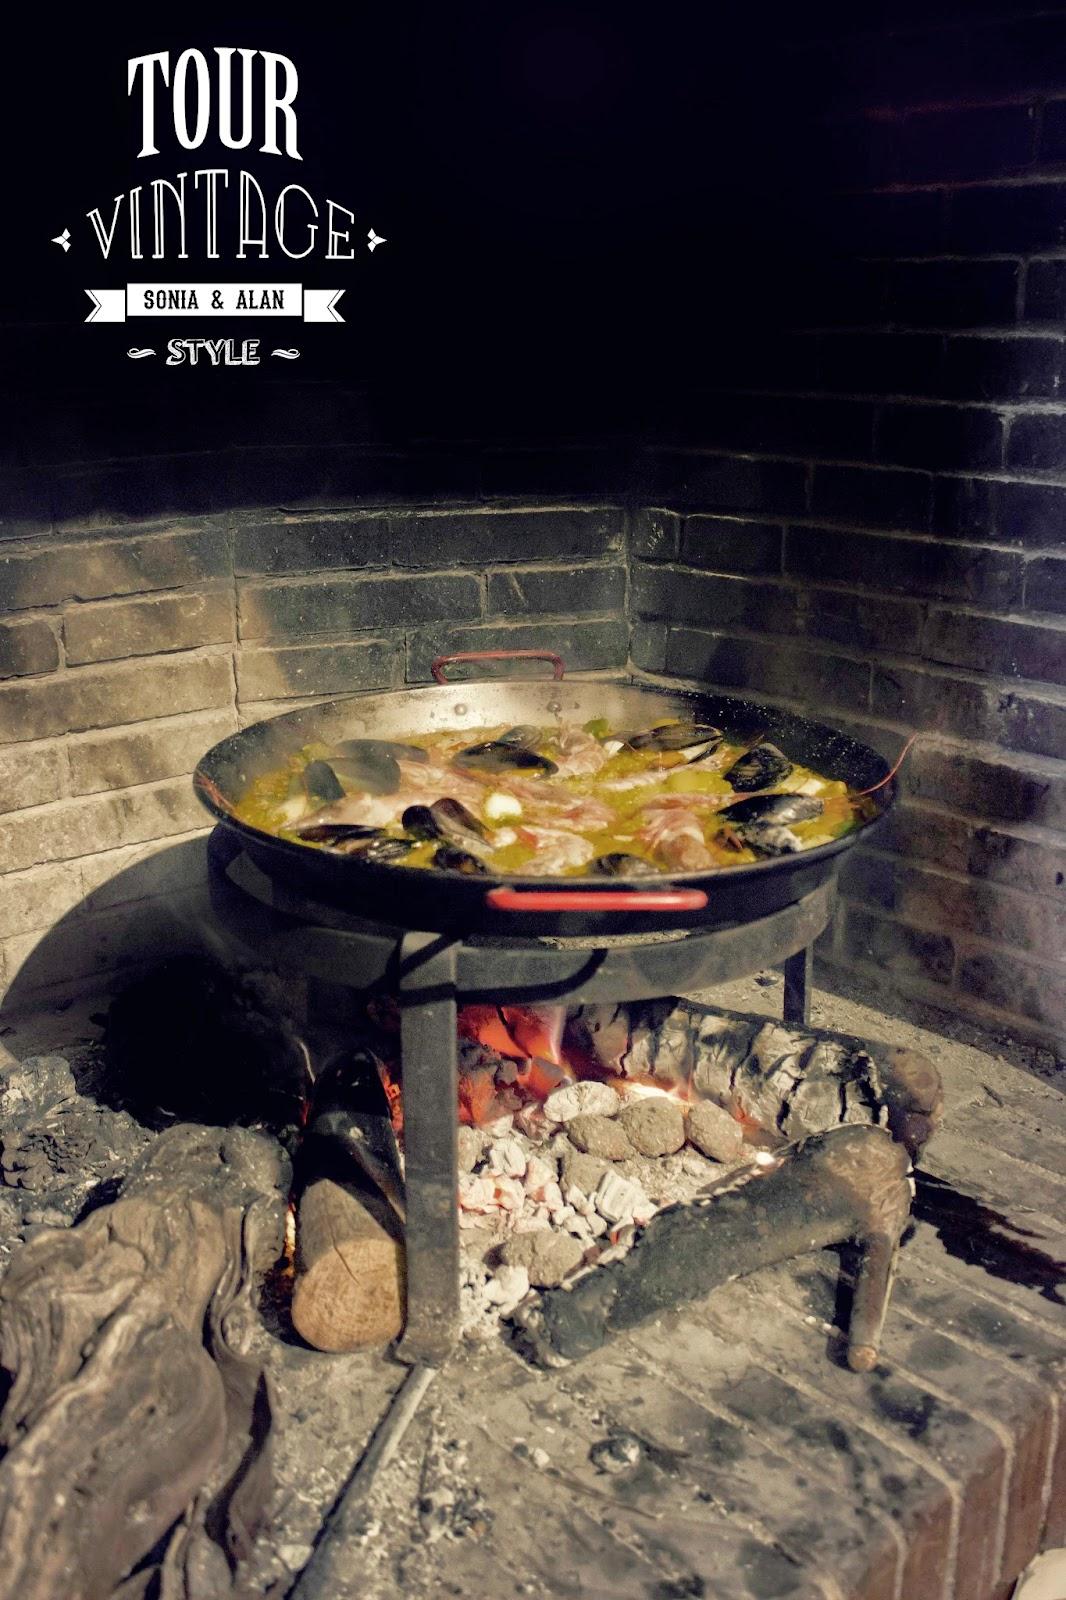 Casa rural la pintora Requena. Paella. Alan Blesa y Sonia Soler. tourvintage.blogspot.com